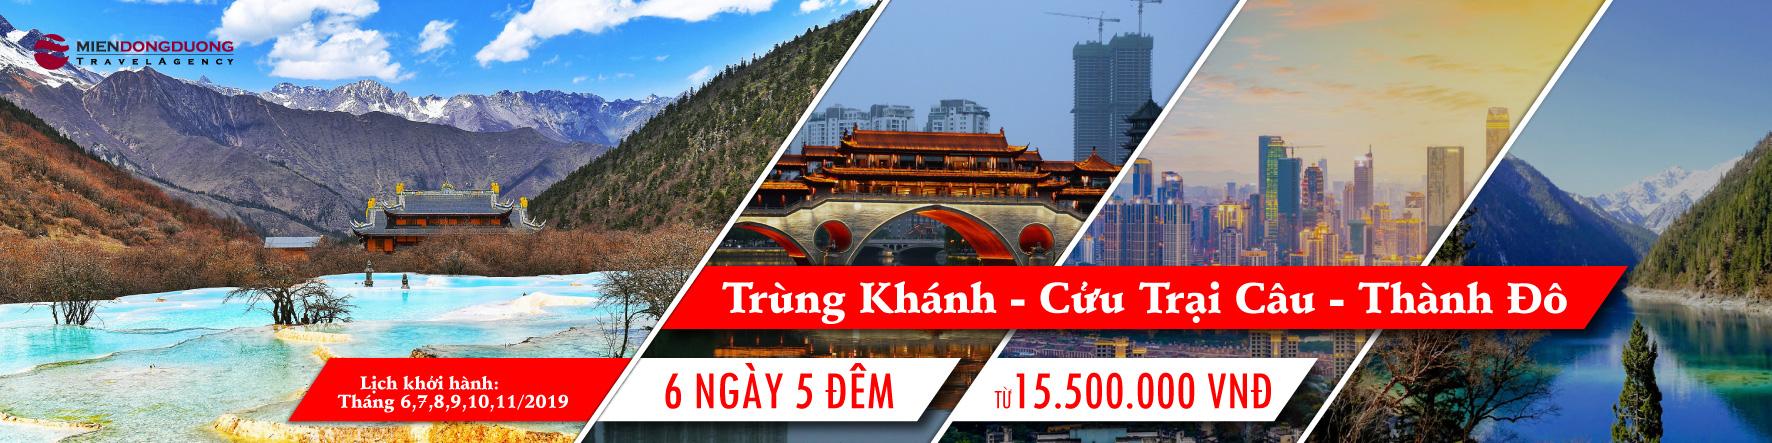 http://miendongduong.com/trung-khanh-cuu-trai-cau-thanh-do-6n5d-2019